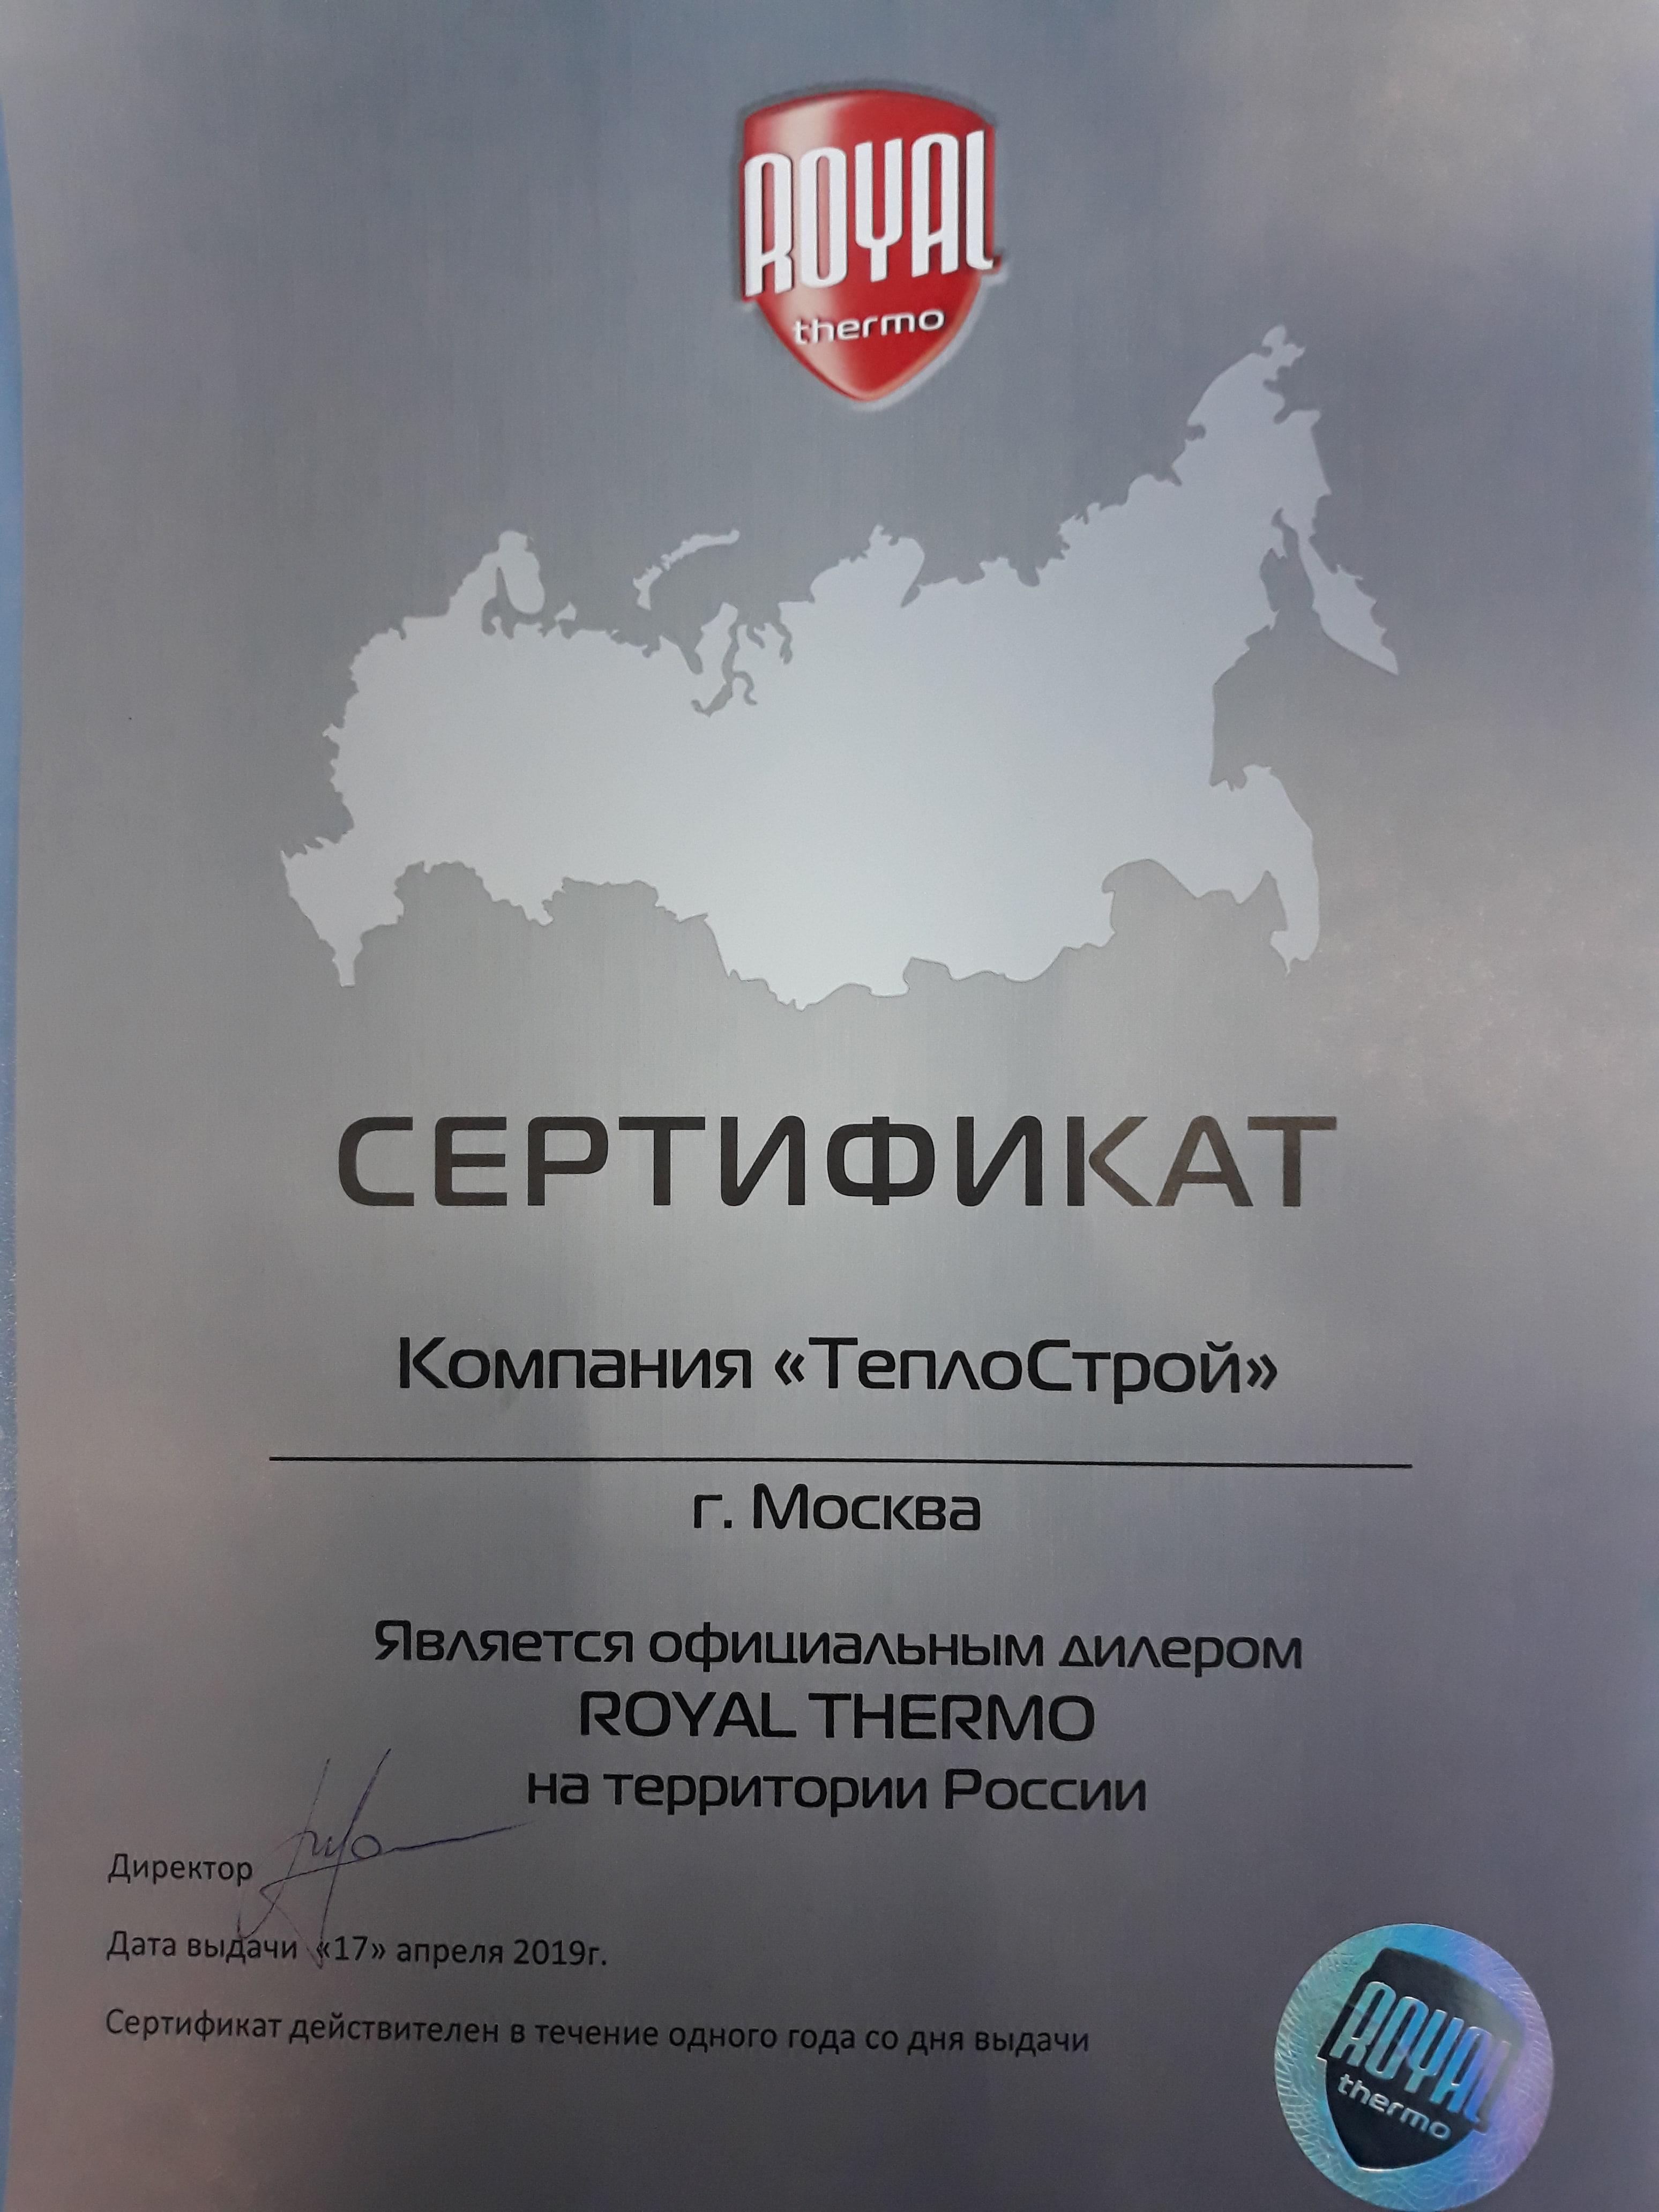 Royal Thermo Сертификат